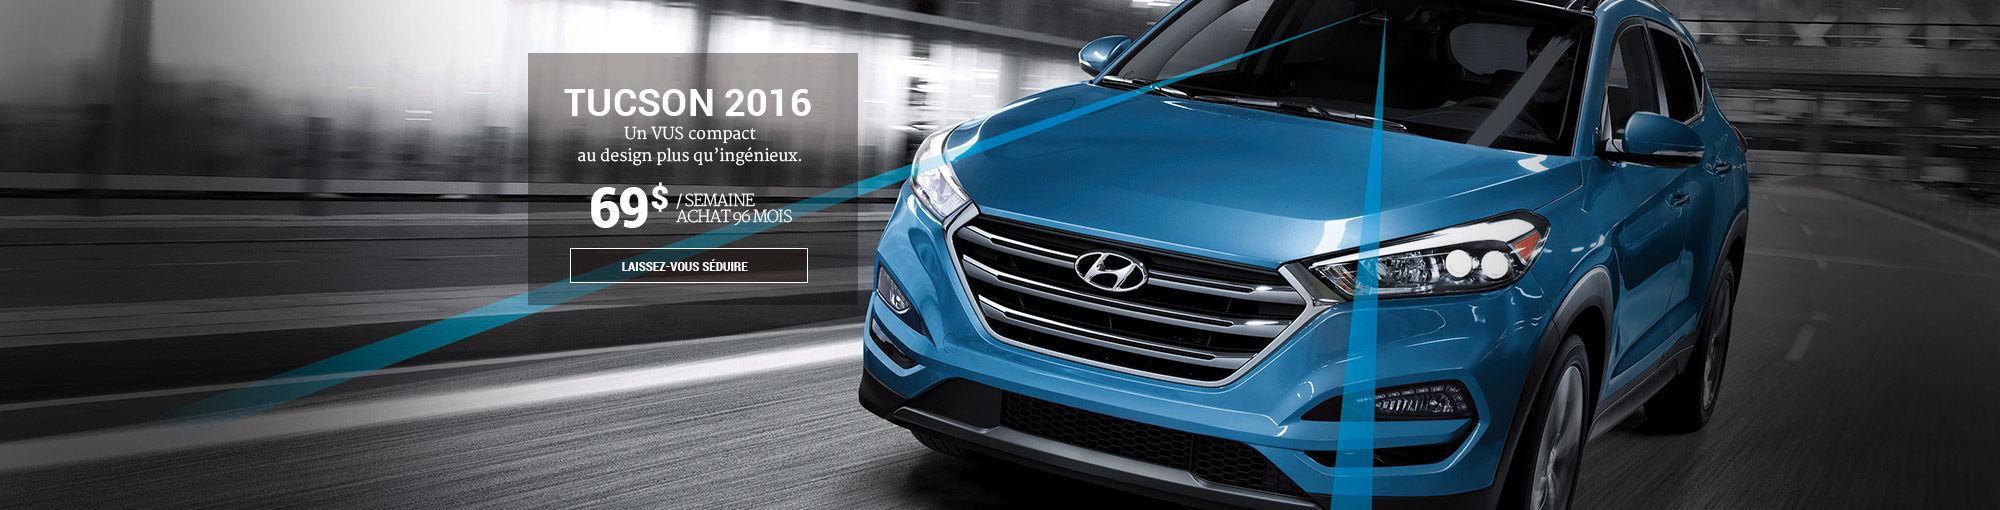 Hyundai Tucson 2016 header -février 2016